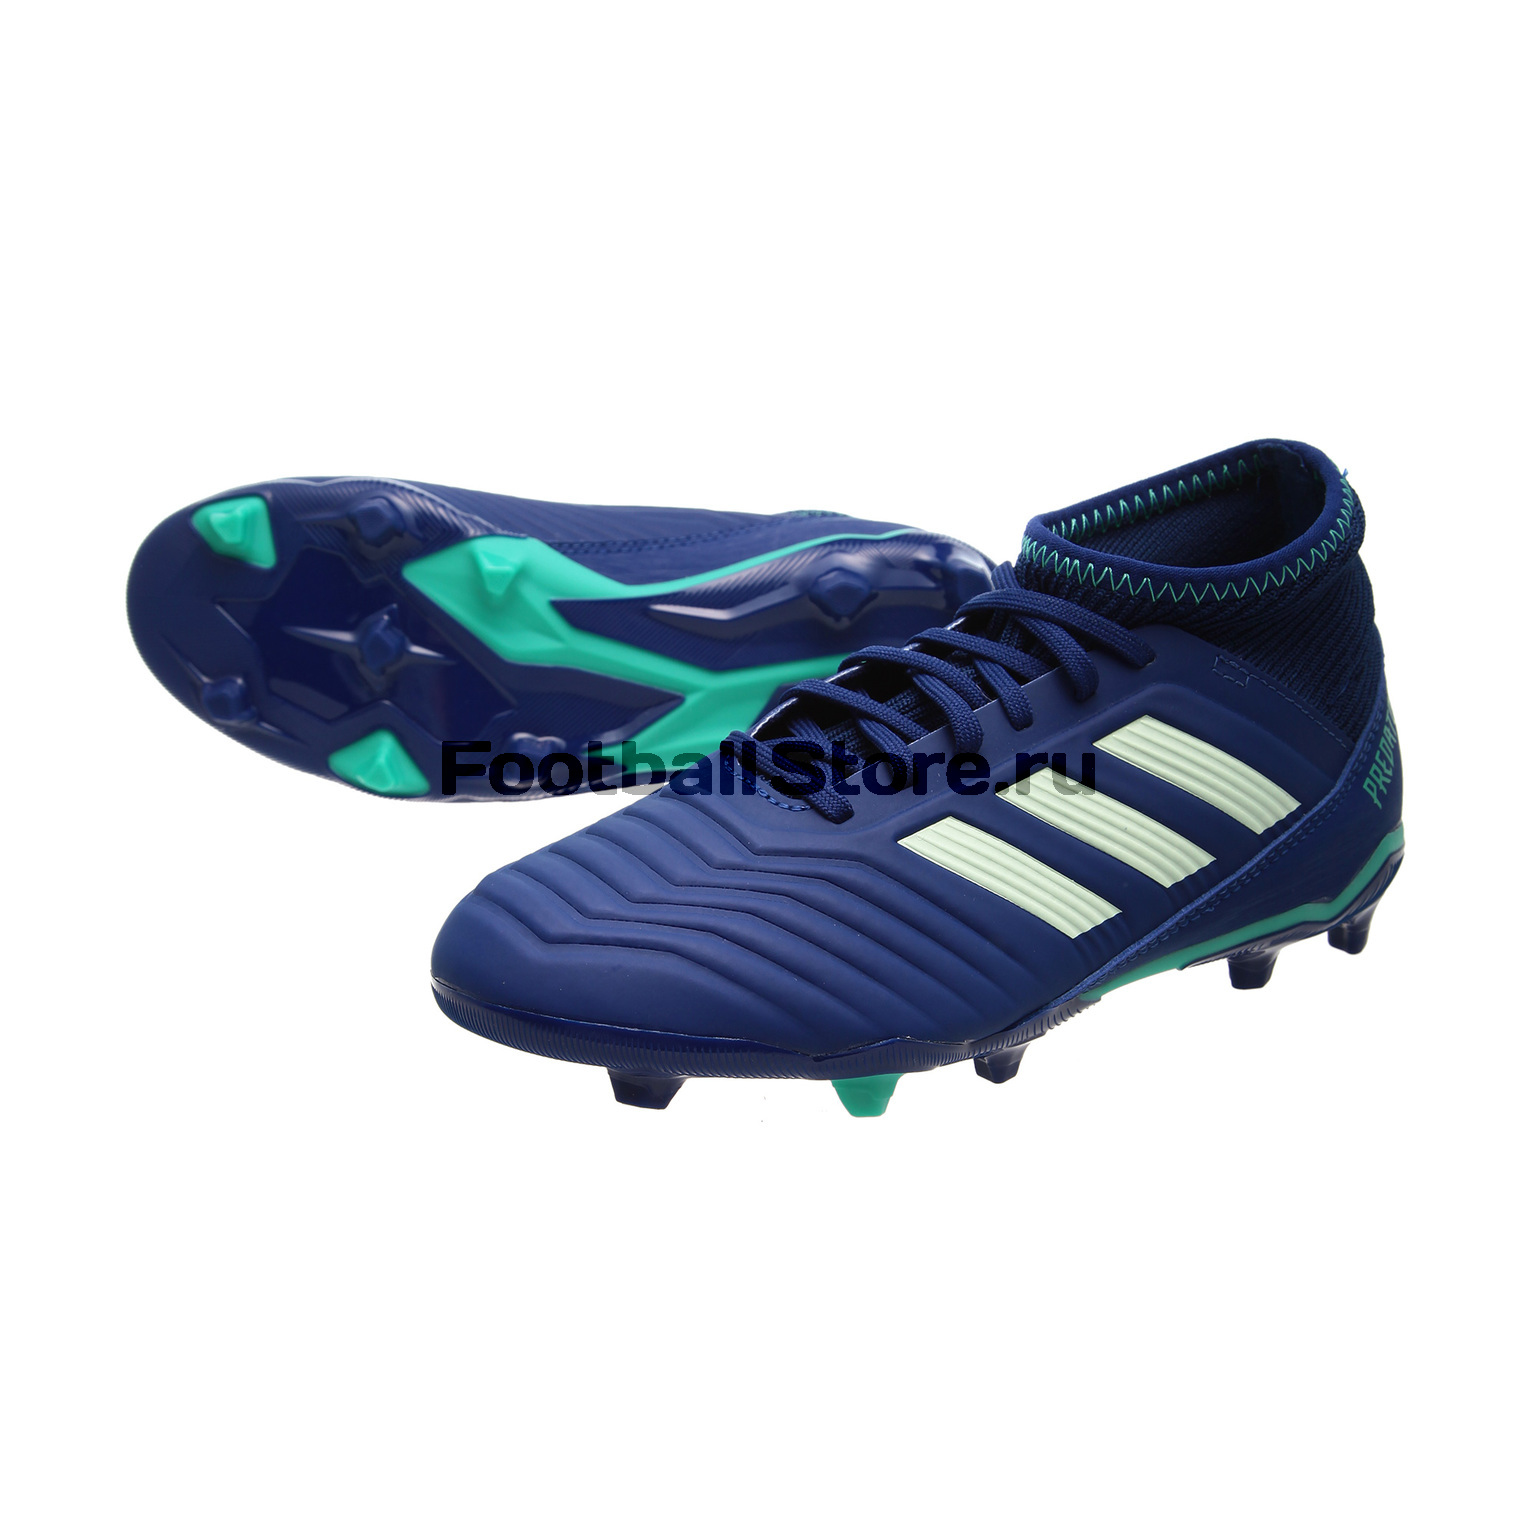 Бутсы Adidas Predator 18.3 FG JR CP9012 adidas predator junior gk glove